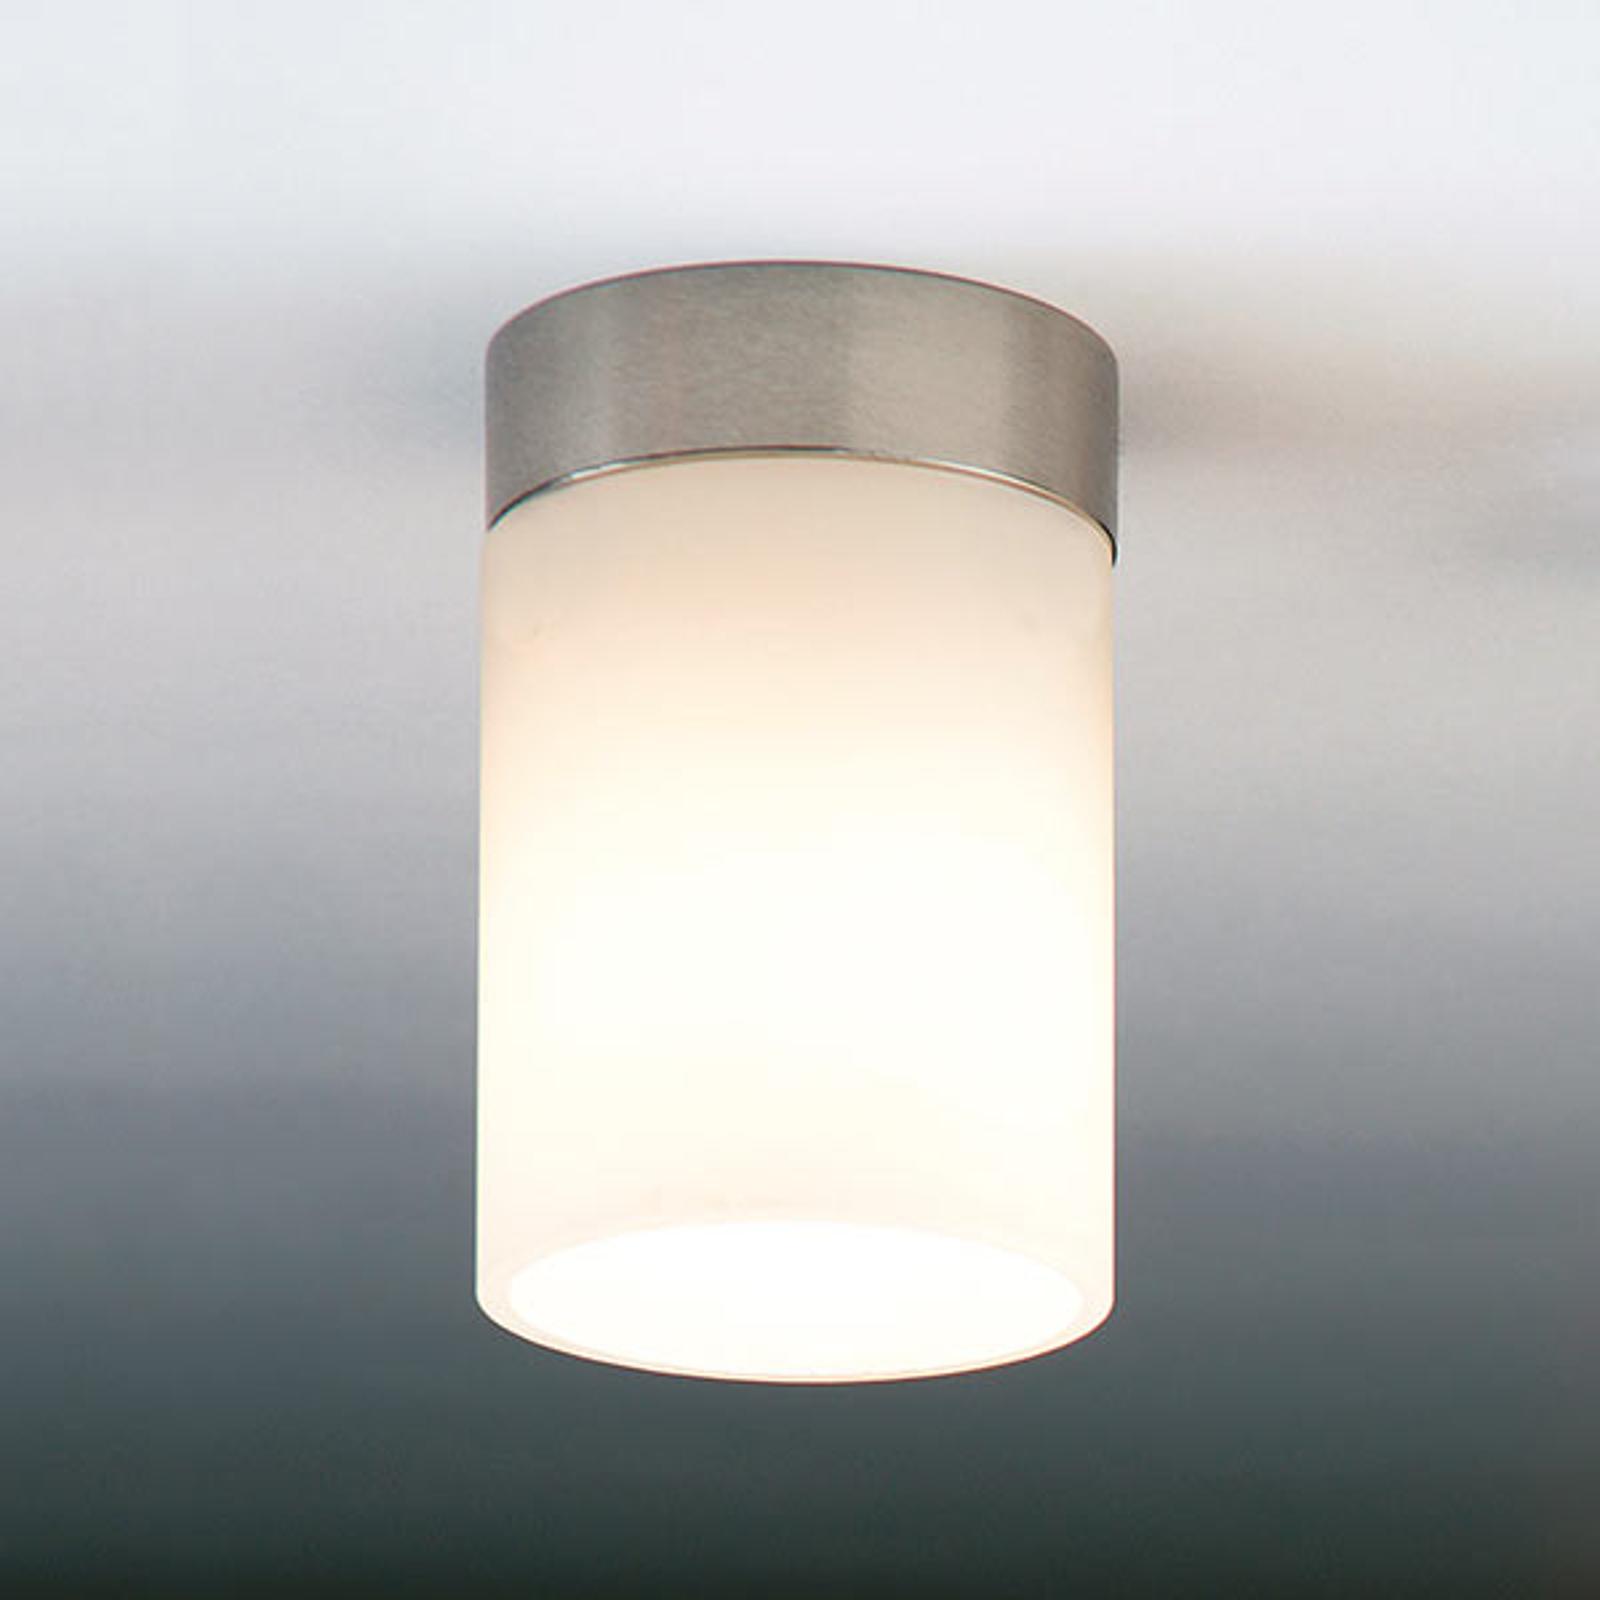 Subtelna lampa sufitowa DELA BOX SHORT, nikiel mat